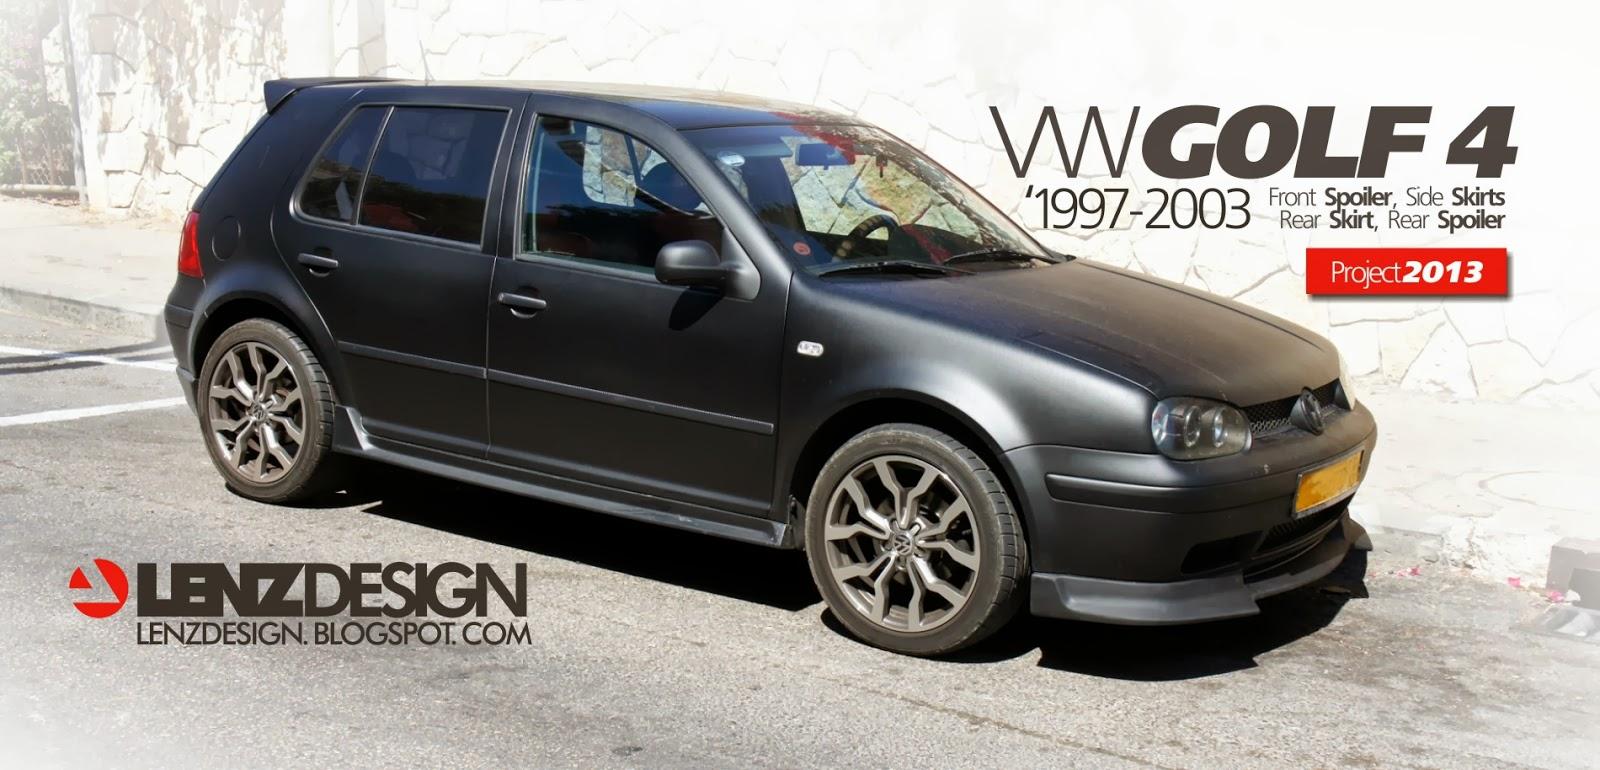 Auto Performance Shop >> VW Golf 4 Tuning Lenzdesign. שיפורים חיצוניים לרכב - Auto Cars Benz